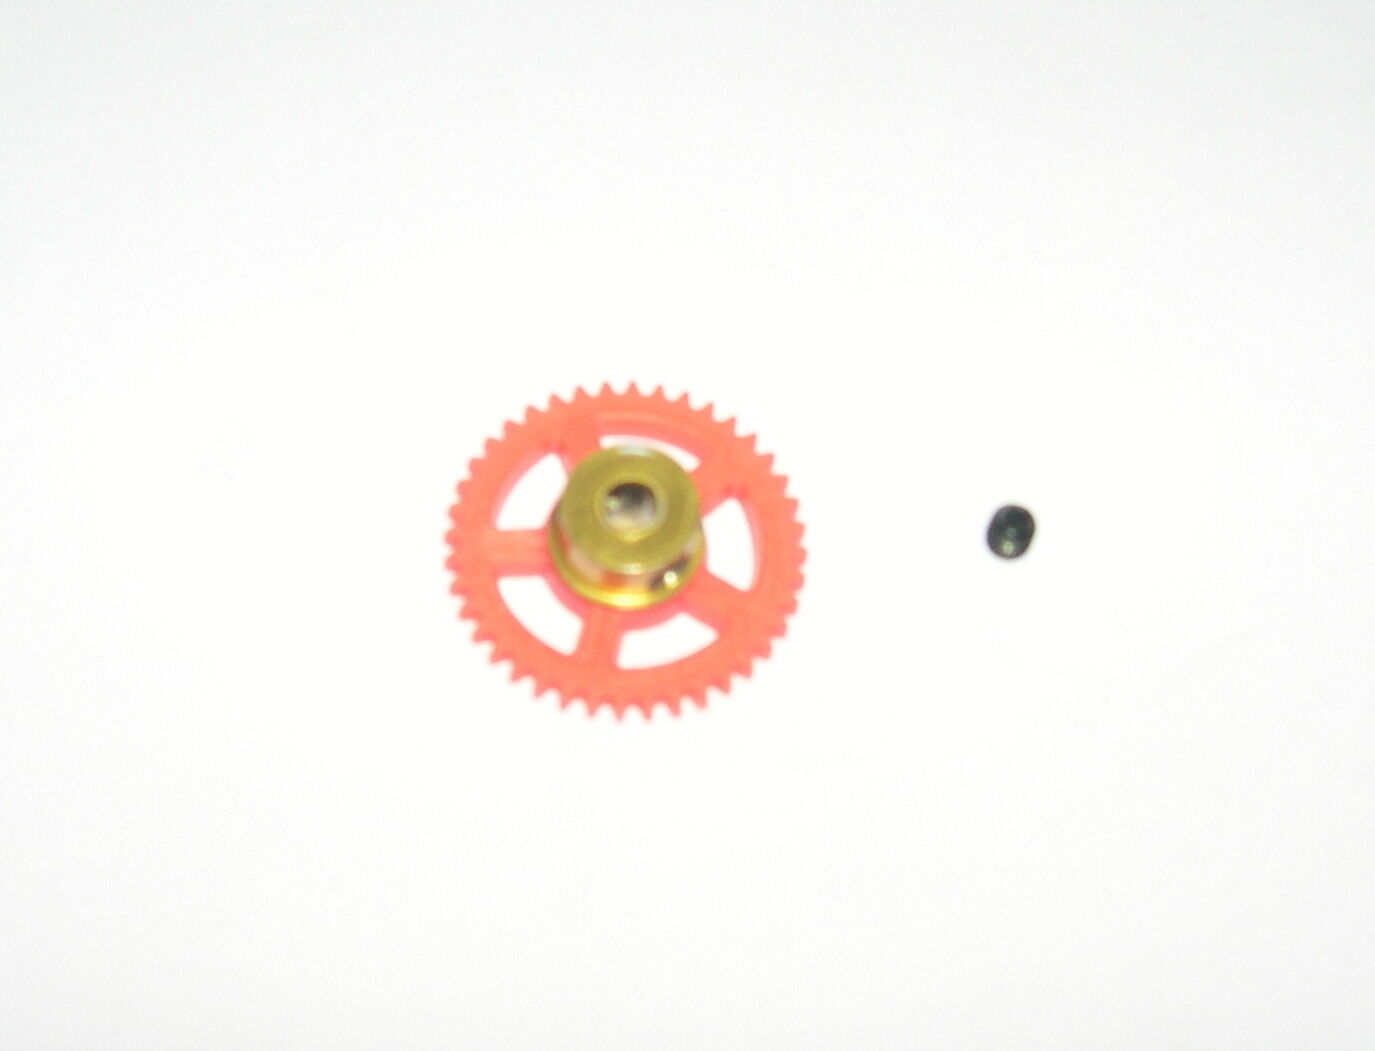 SCALEAUTO SC-1052B CROWN 40D M50 NYLON NYLON NYLON PROCOMP RS AXIS 0 1 8in 3be714